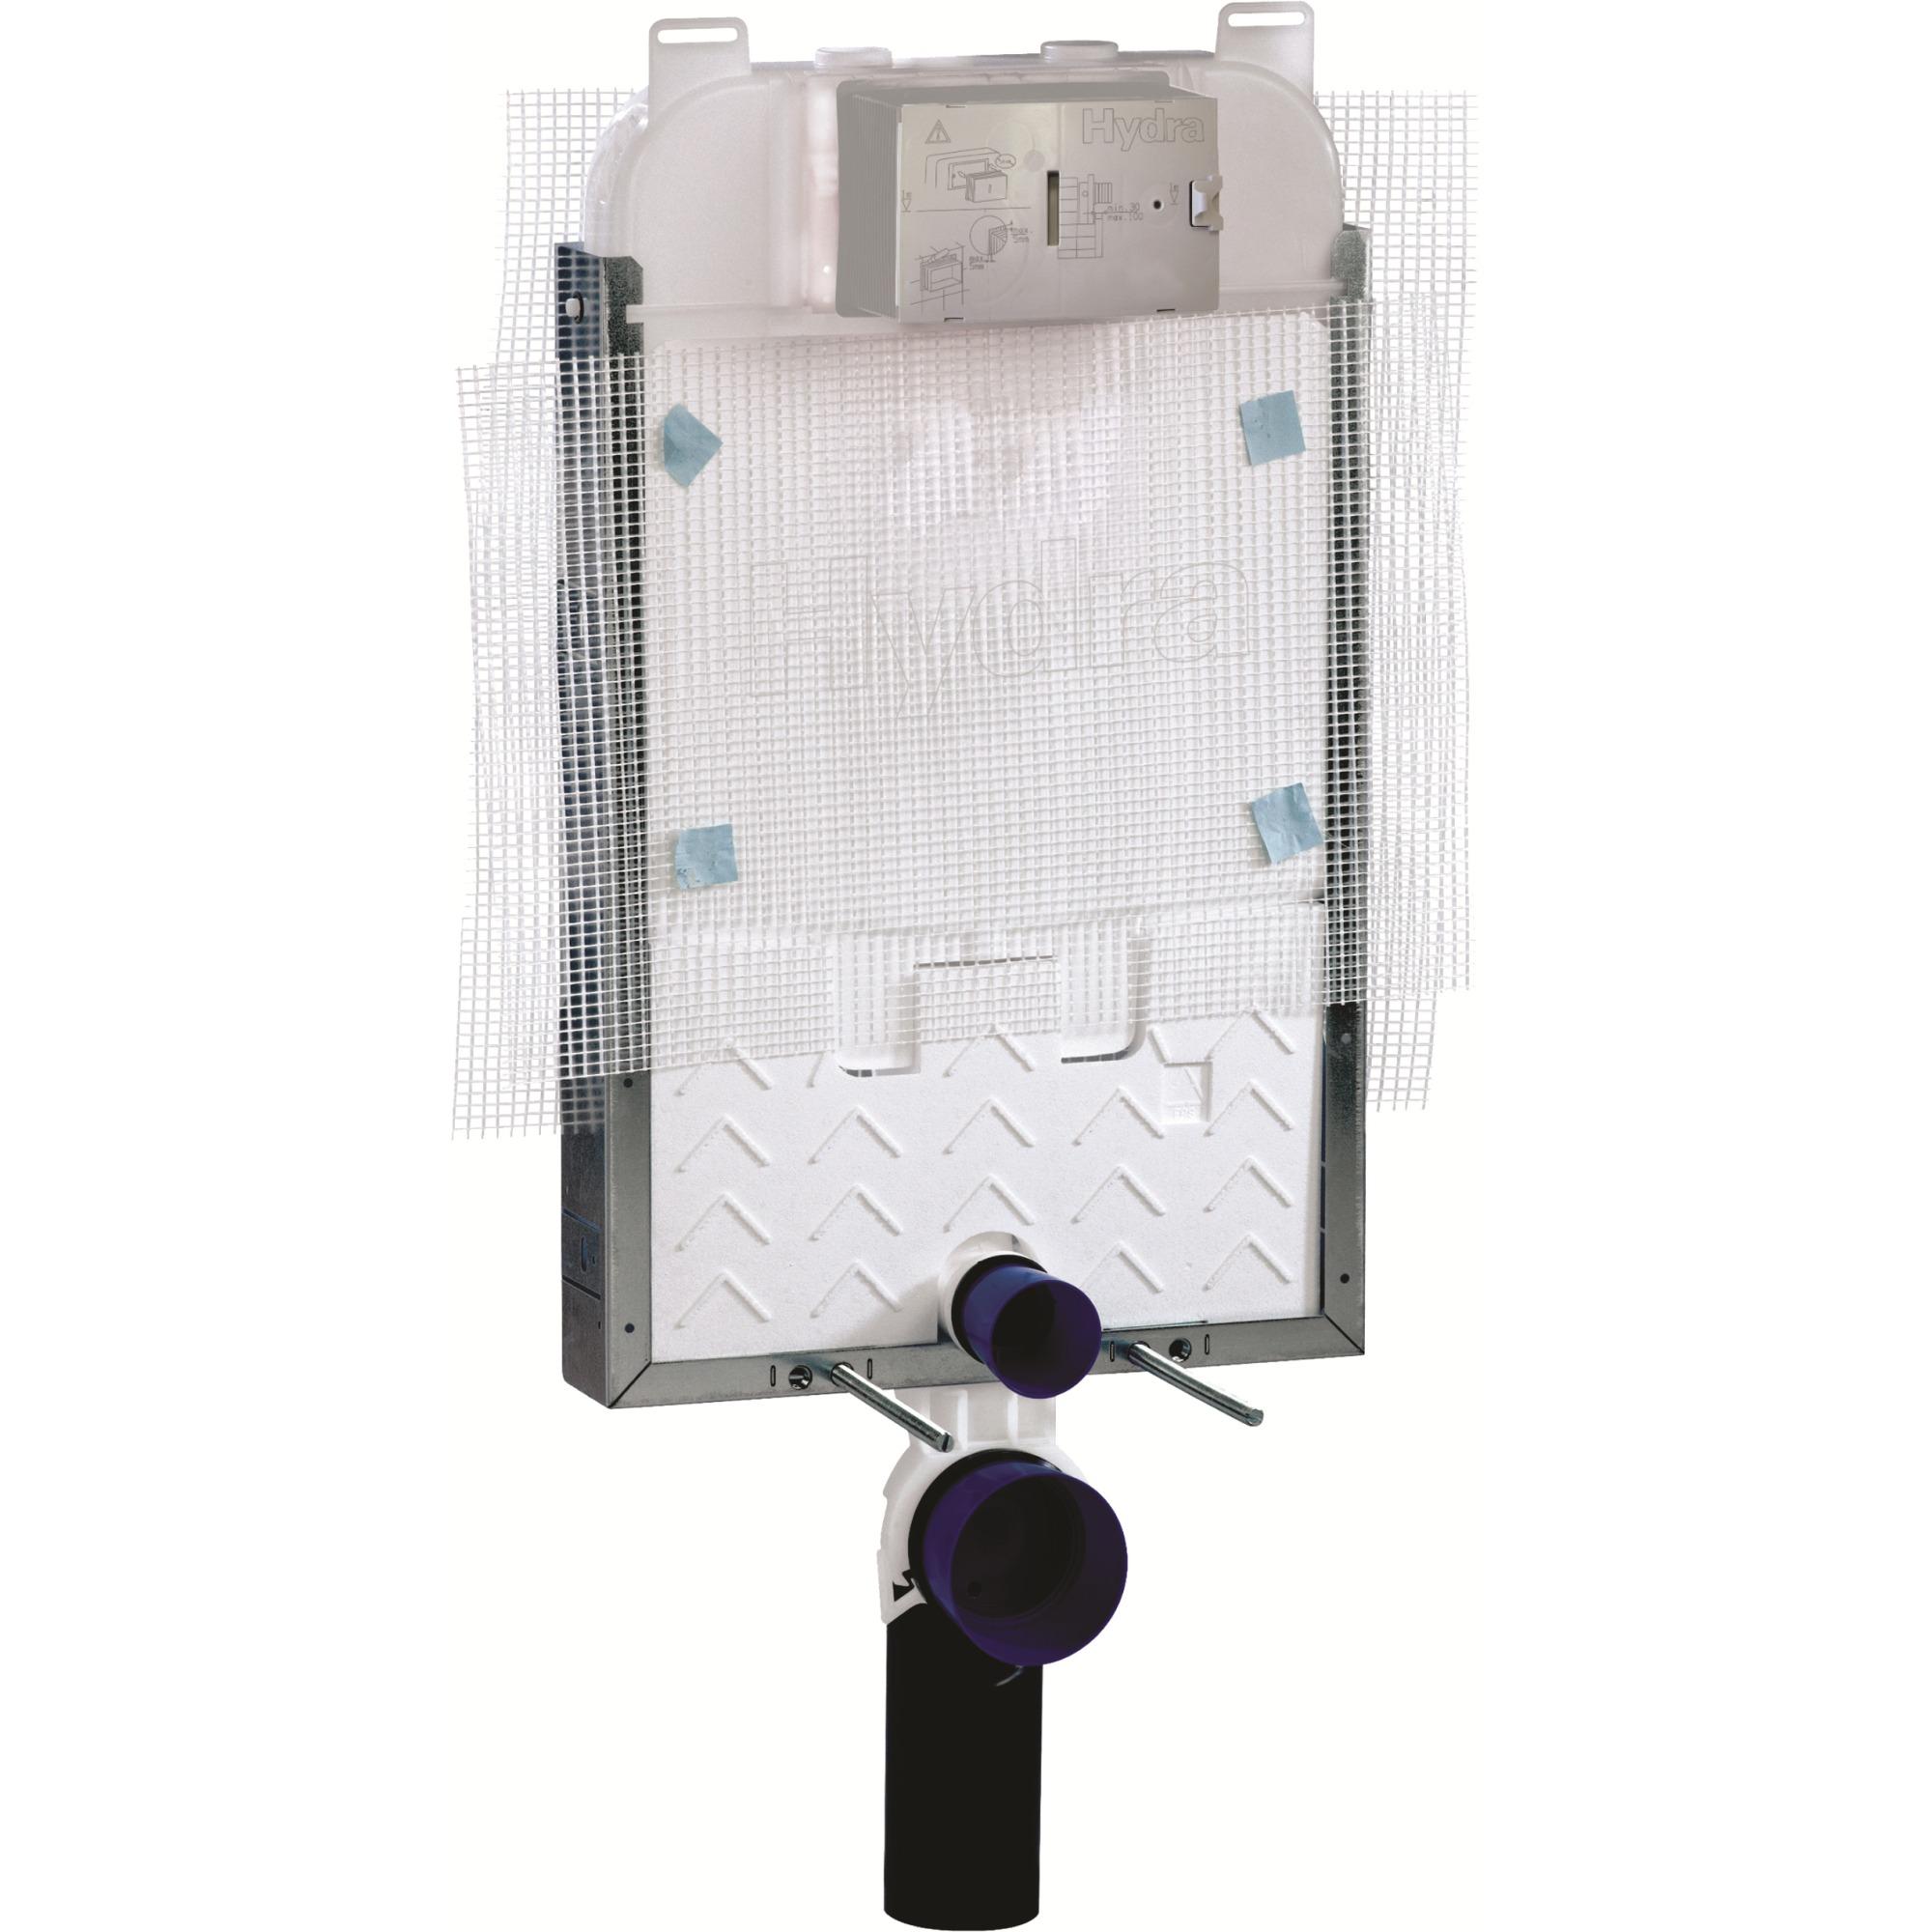 Caixa Embutida para Descarga de Bacia Suspensa 36L Hydra - Deca Metais